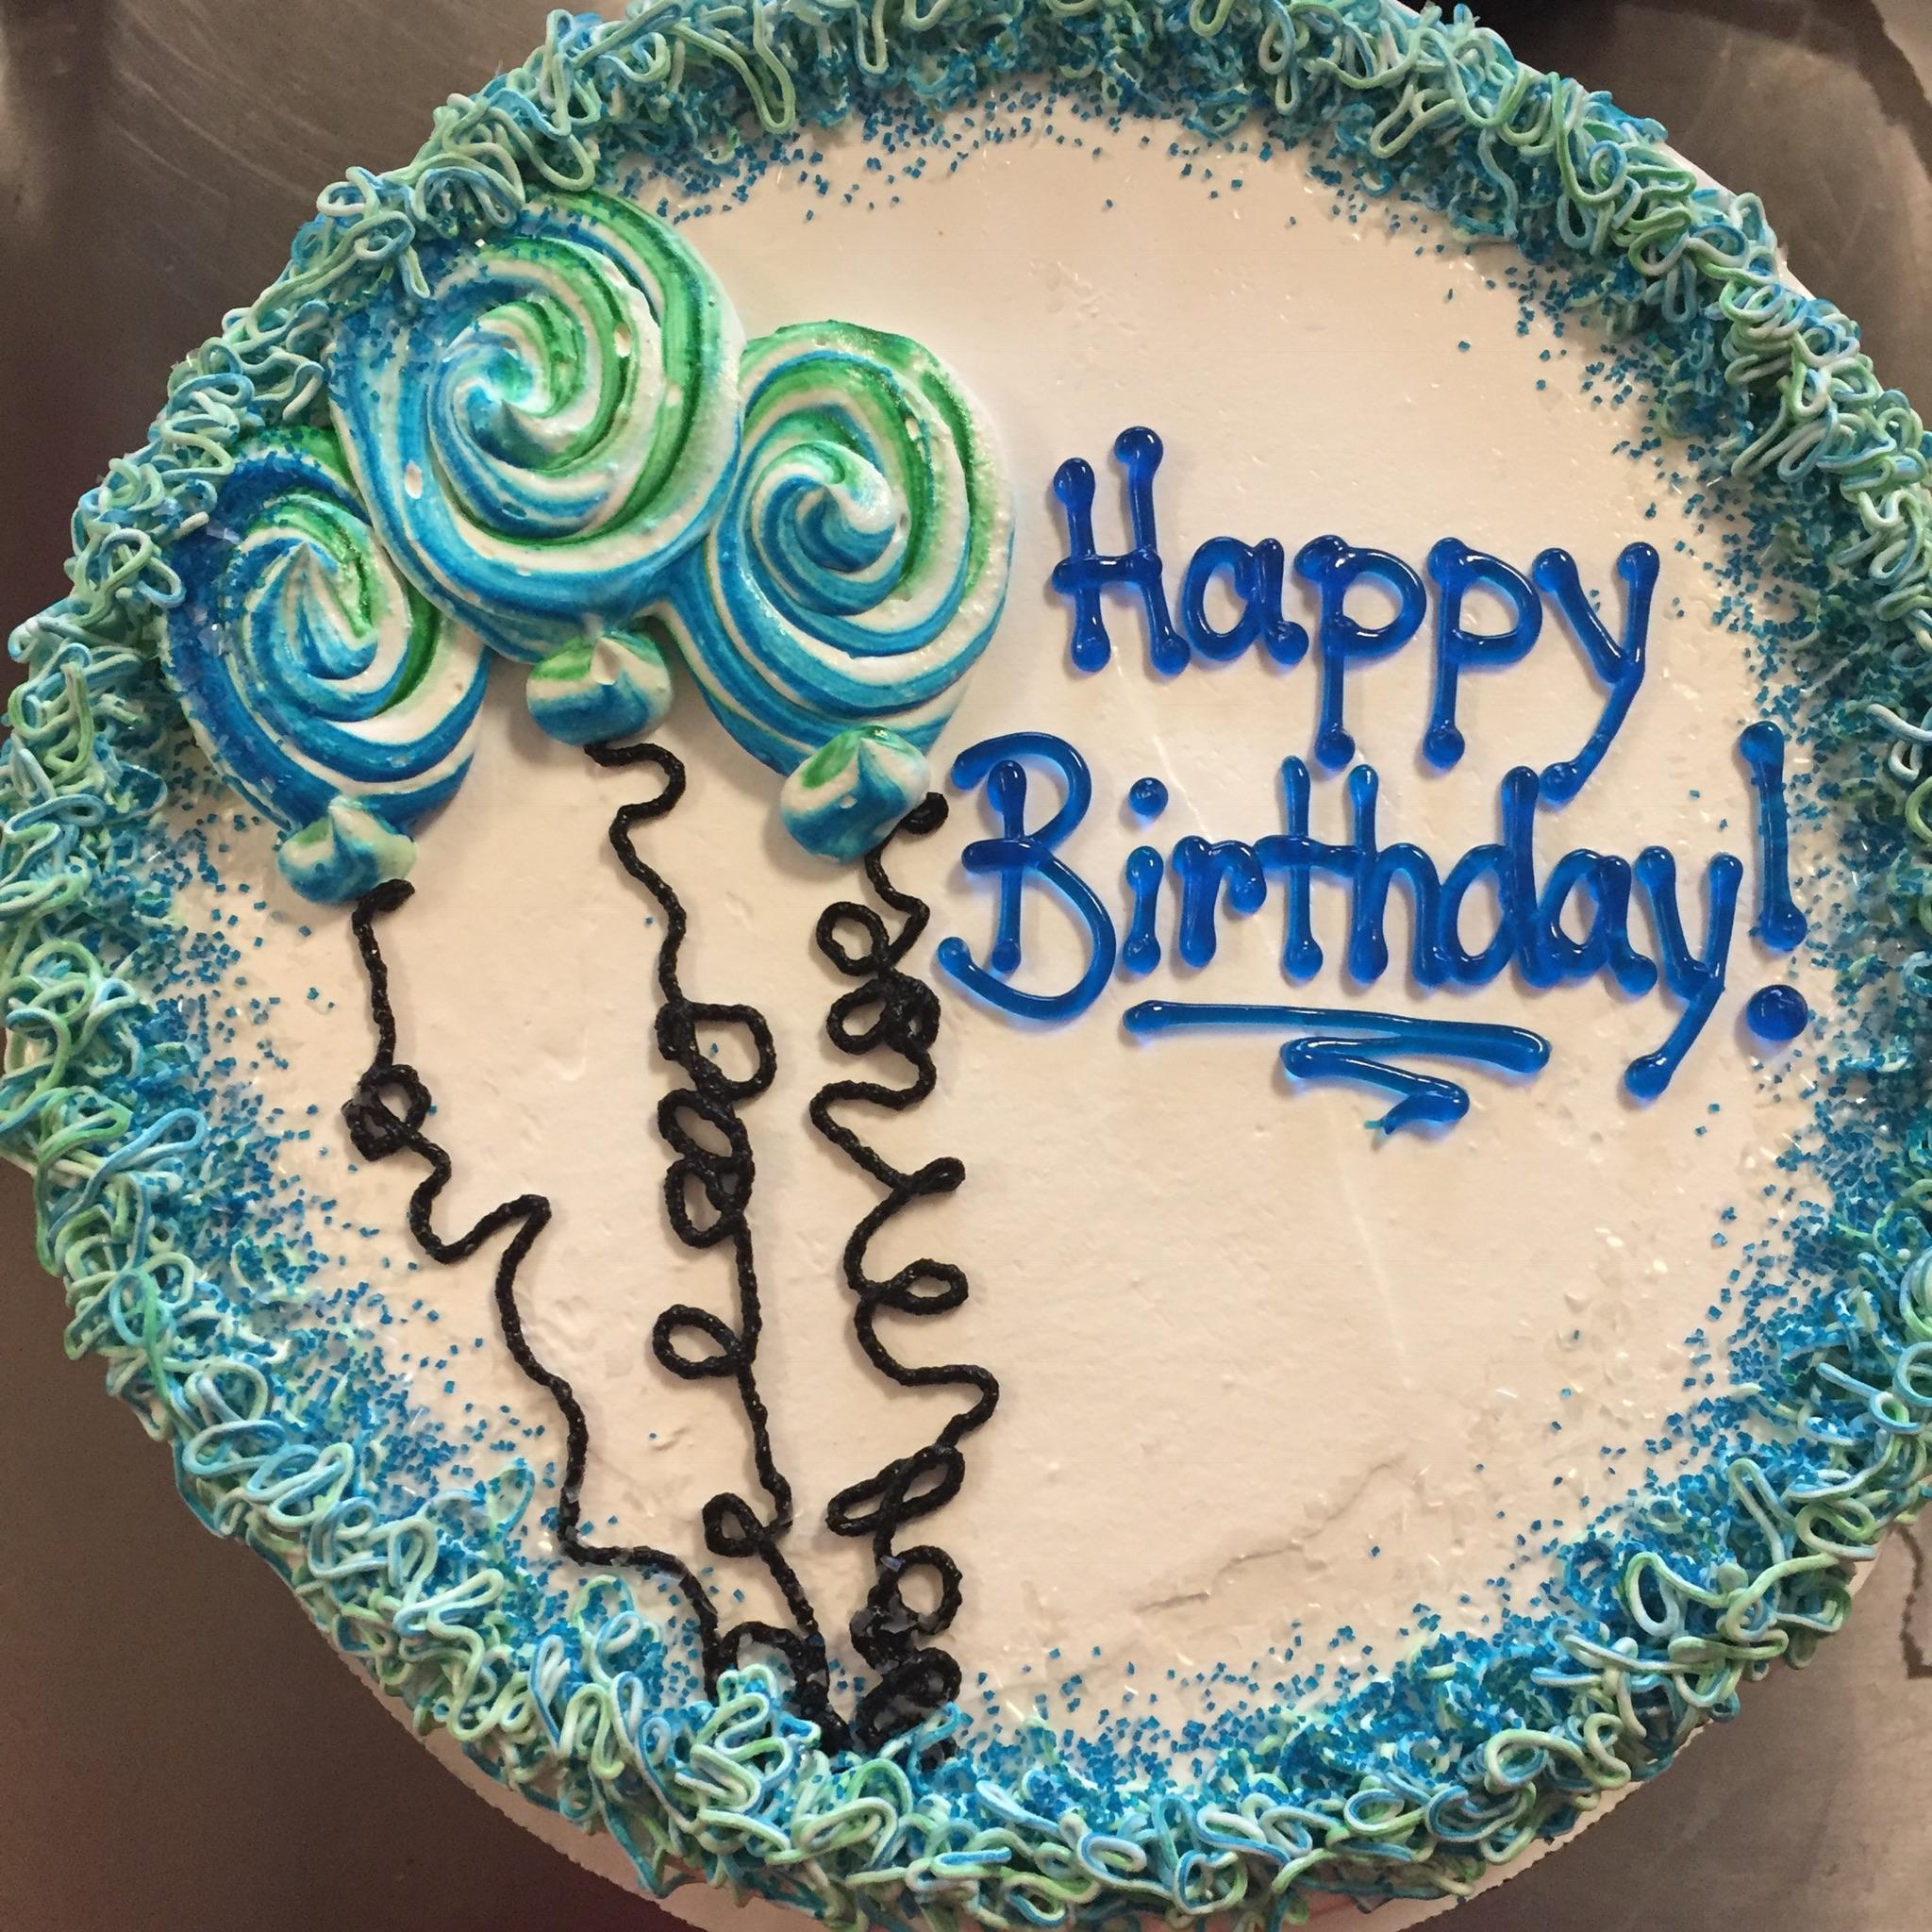 Cake Design #7